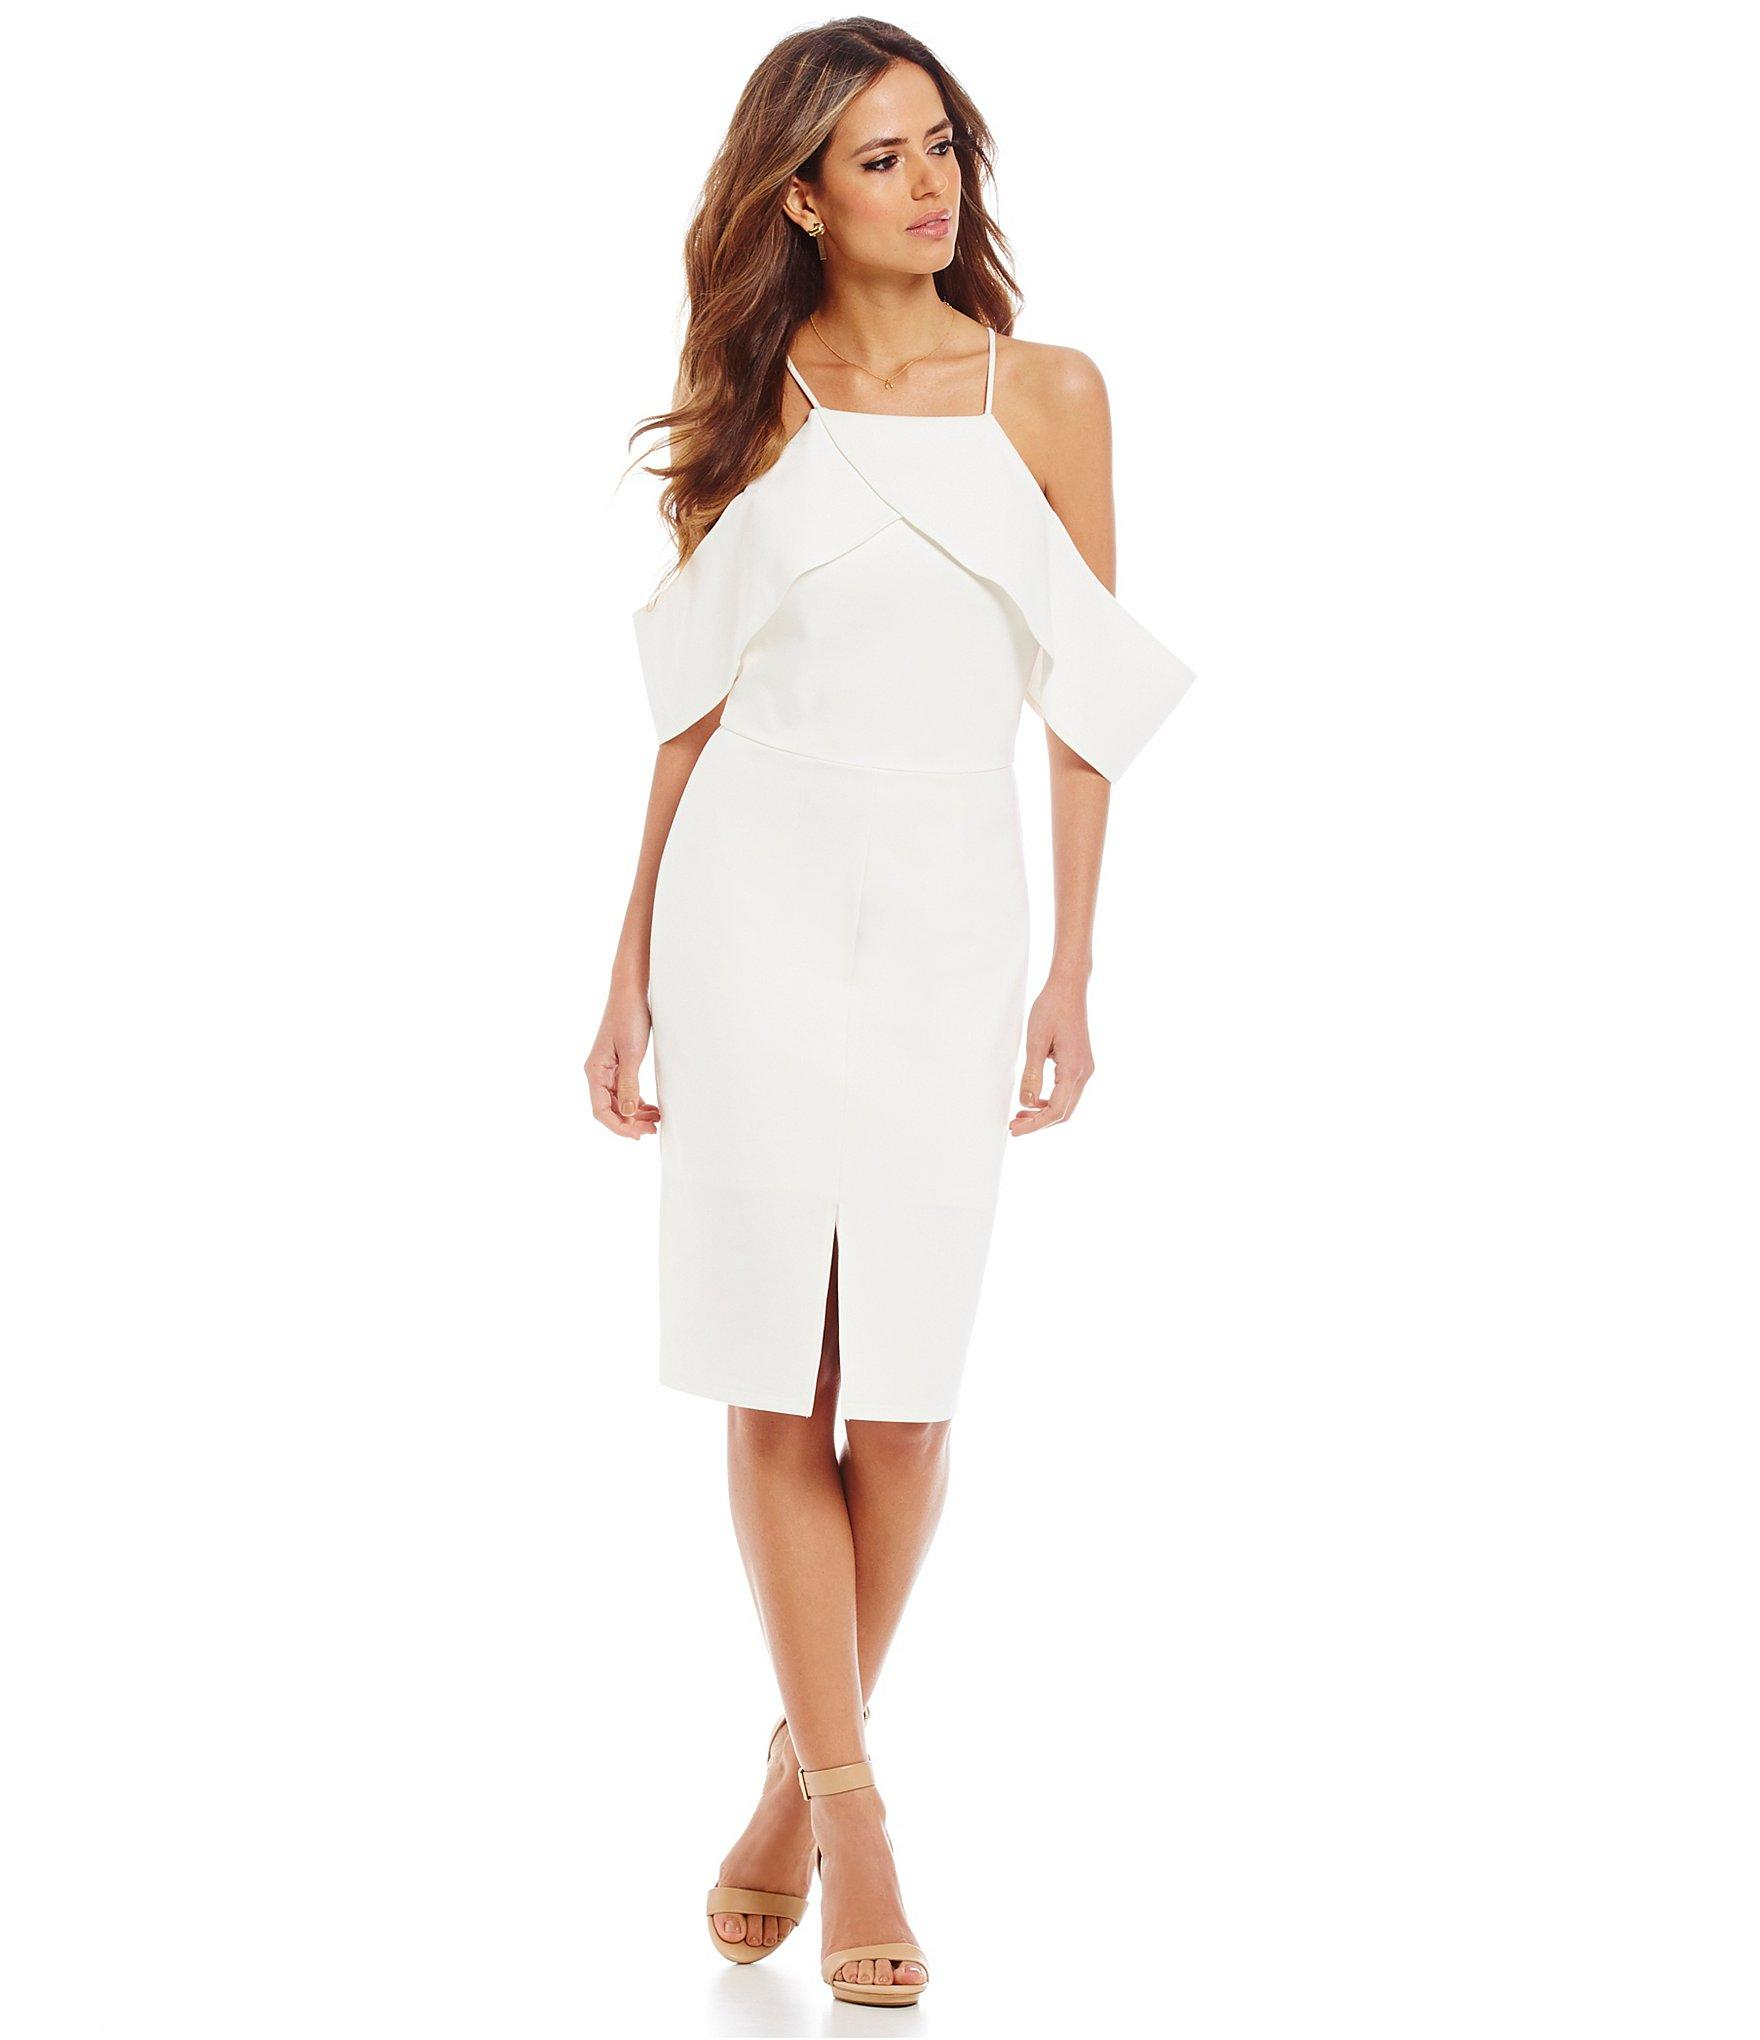 a51026278a2 Gianni Bini Pilar Ruffled Halter Neck Cold-shoulder Sheath Dress in ...